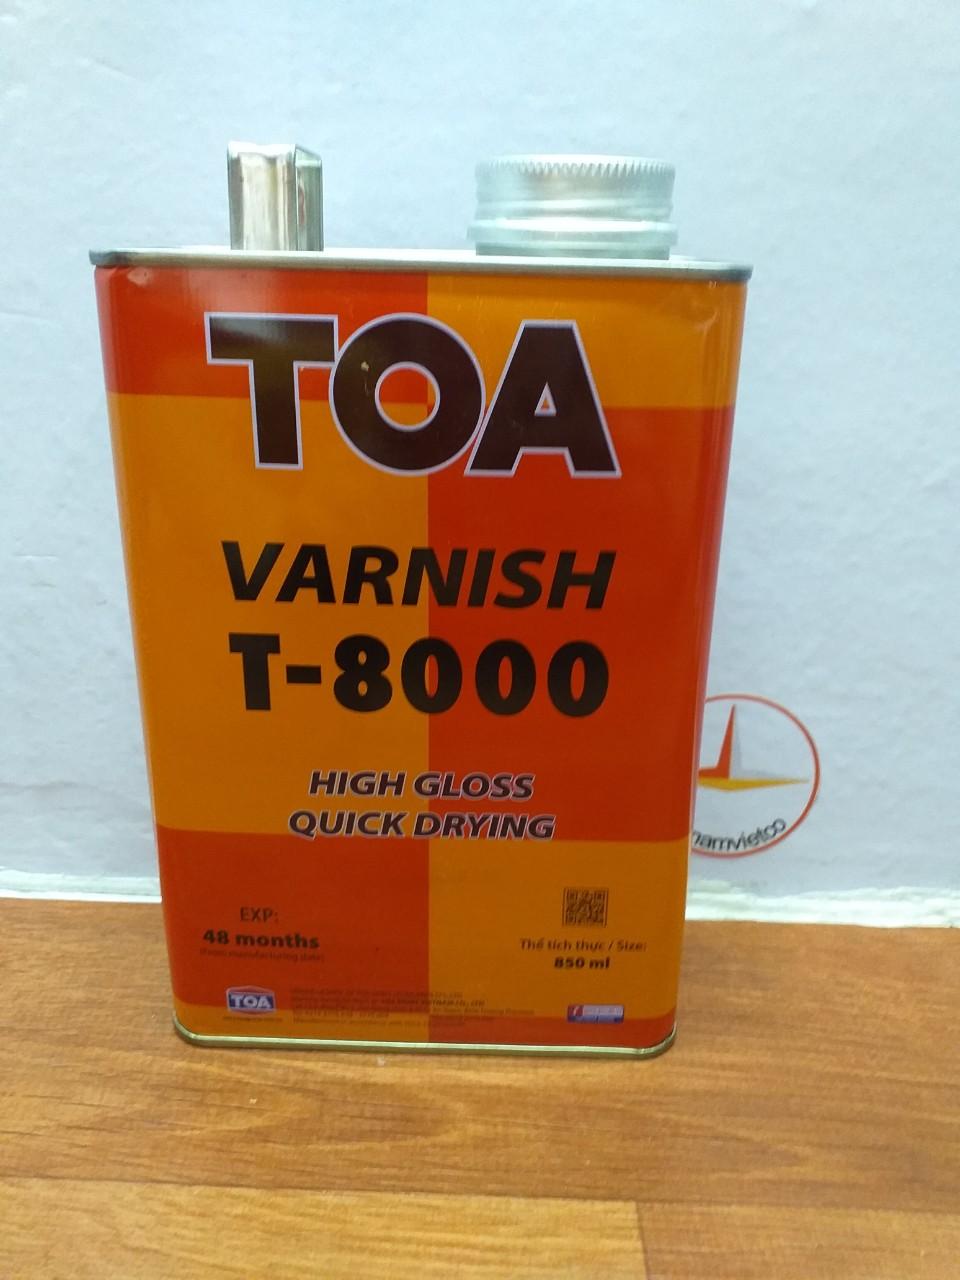 DAU BONG CHO GO TOA T 8000 VARNISH (4)